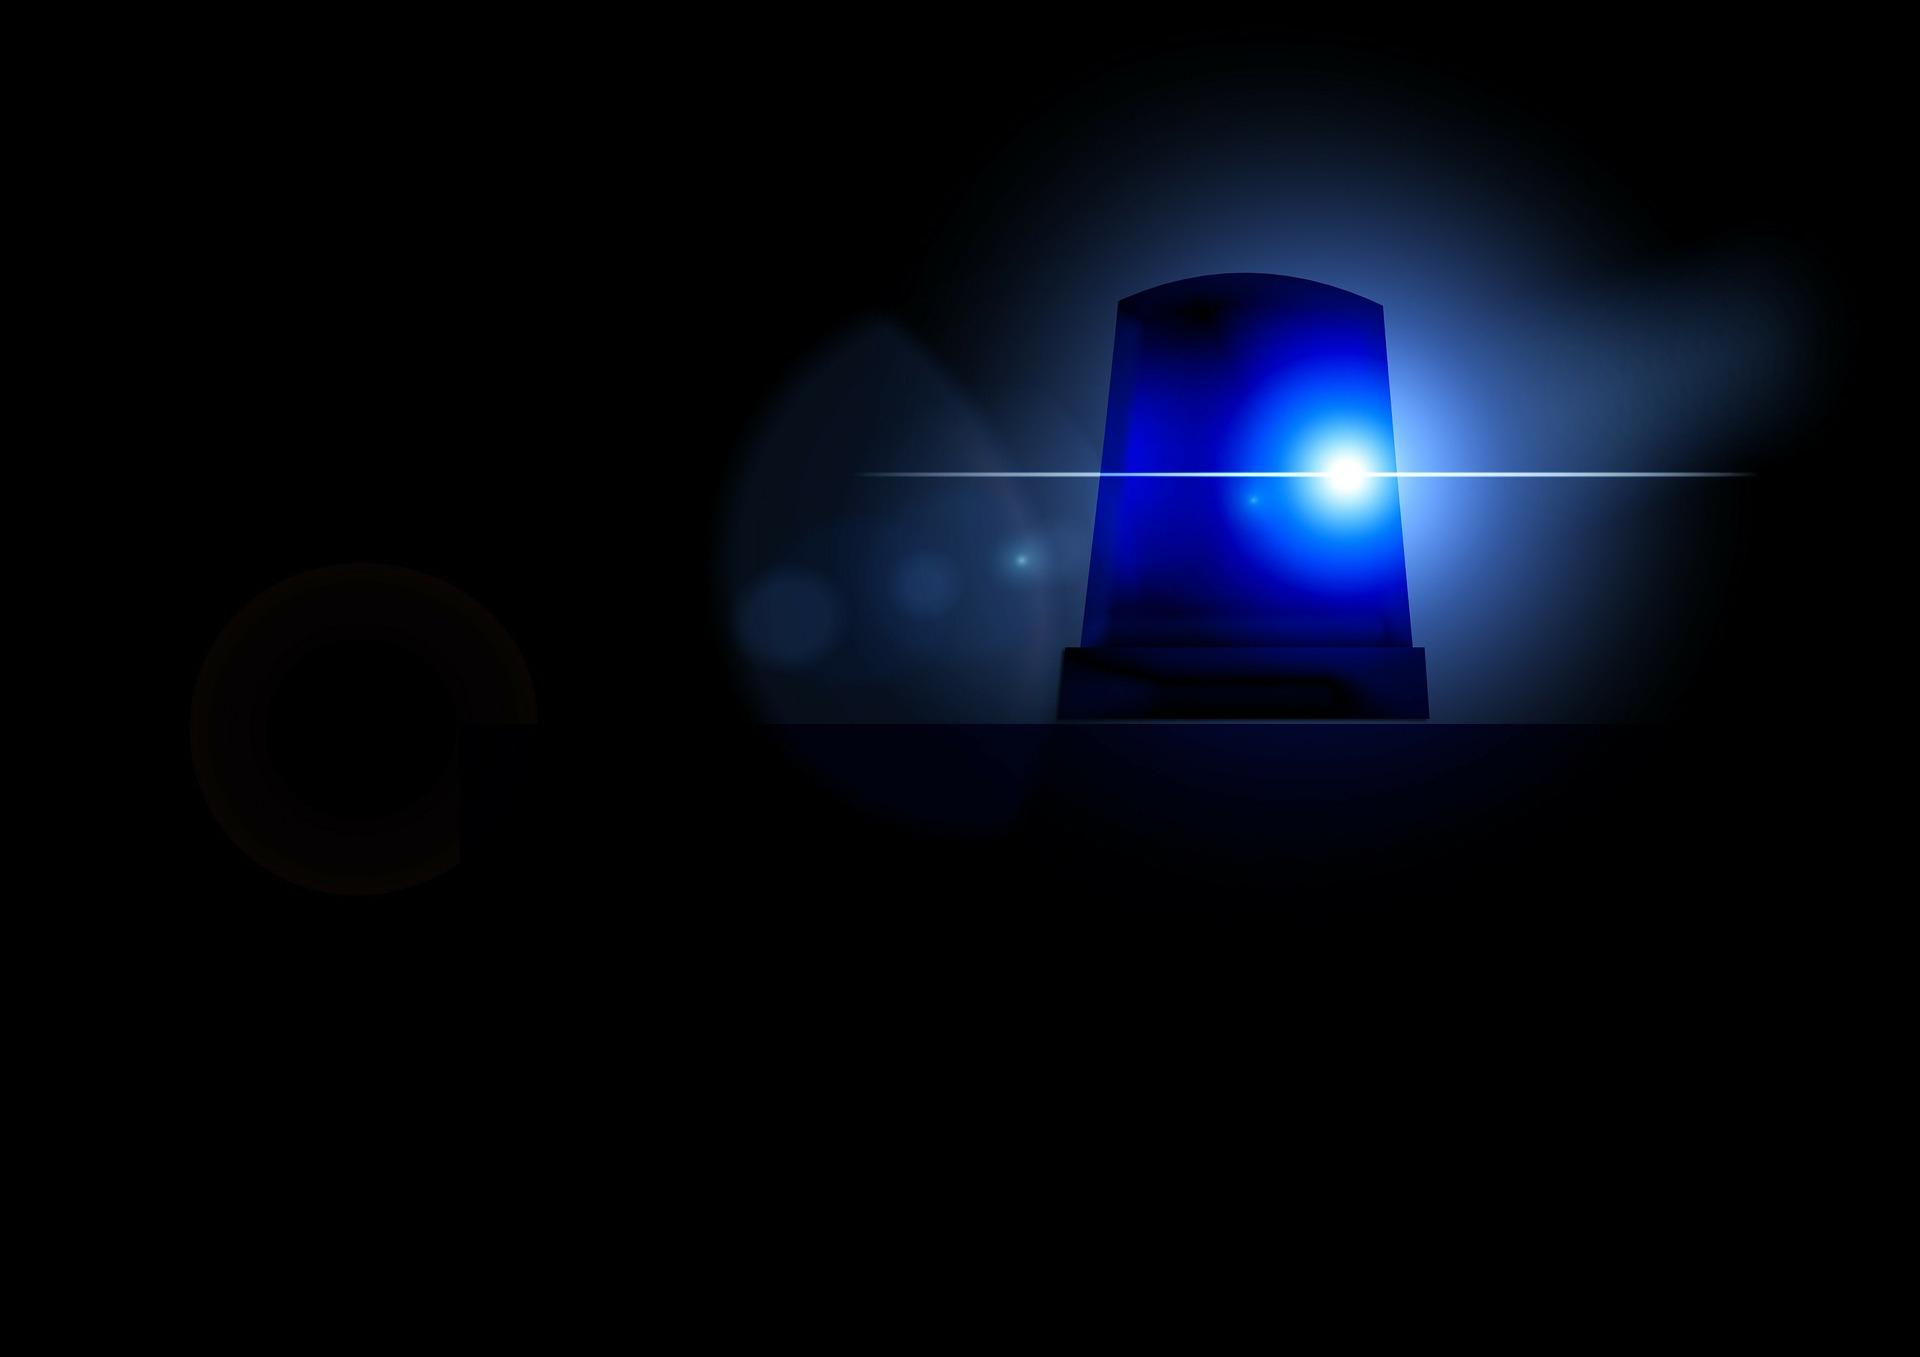 Police light bright against a dark backdrop.